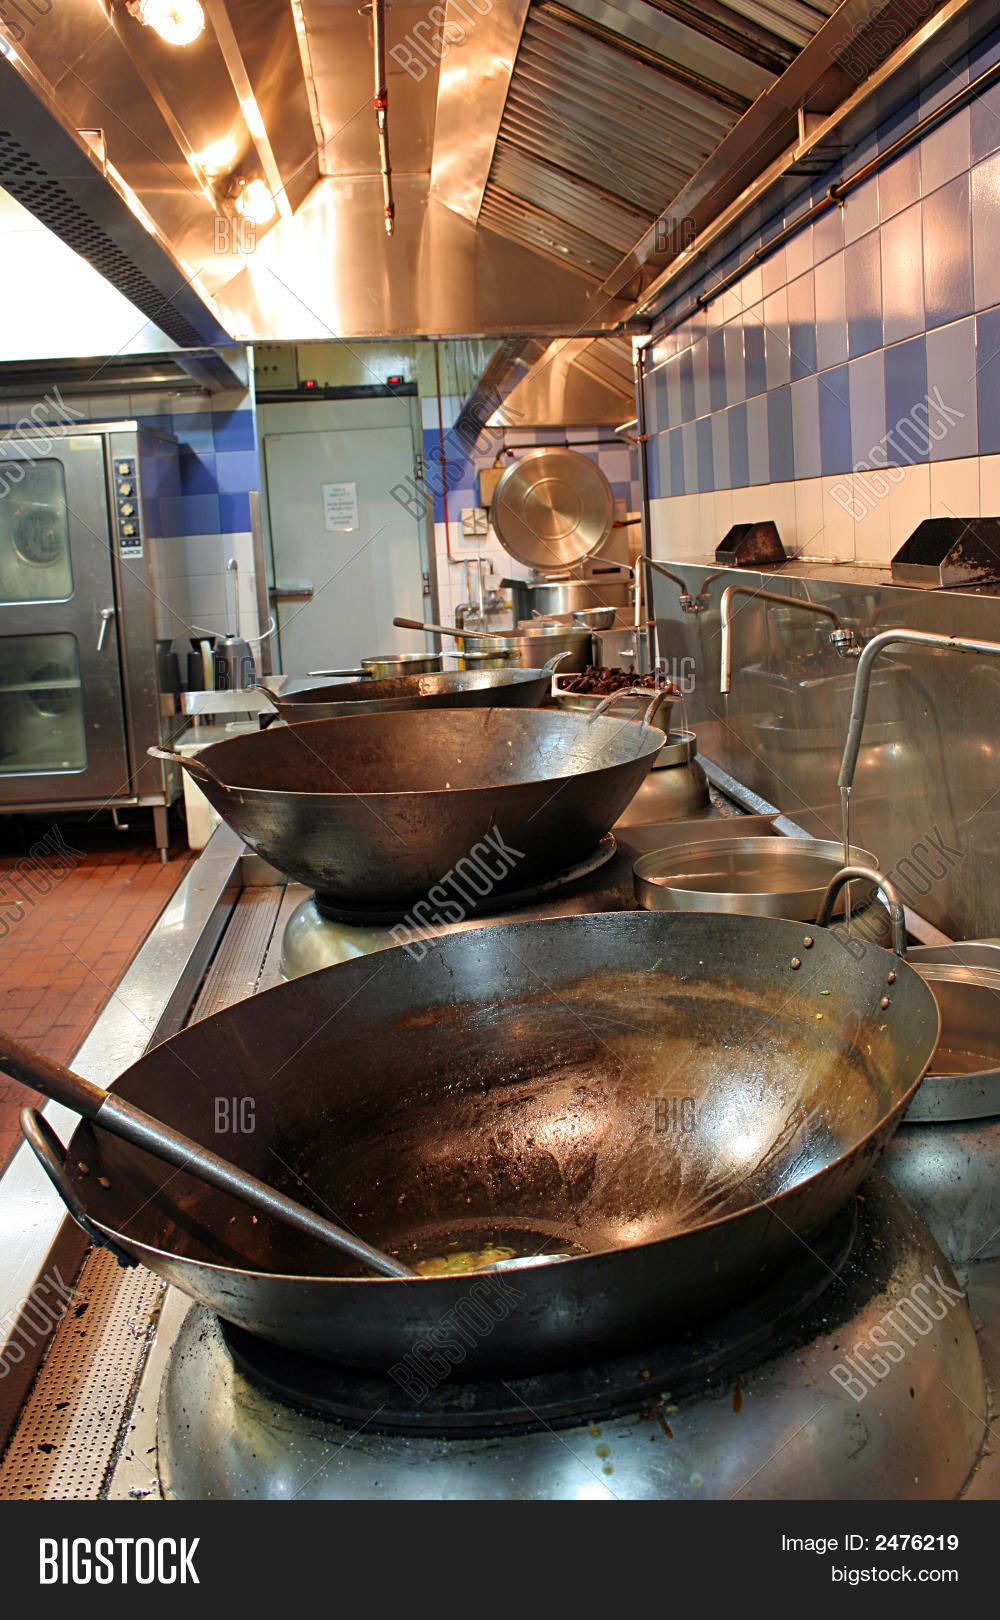 Chinese Restaurant Image Photo Free Trial Bigstock